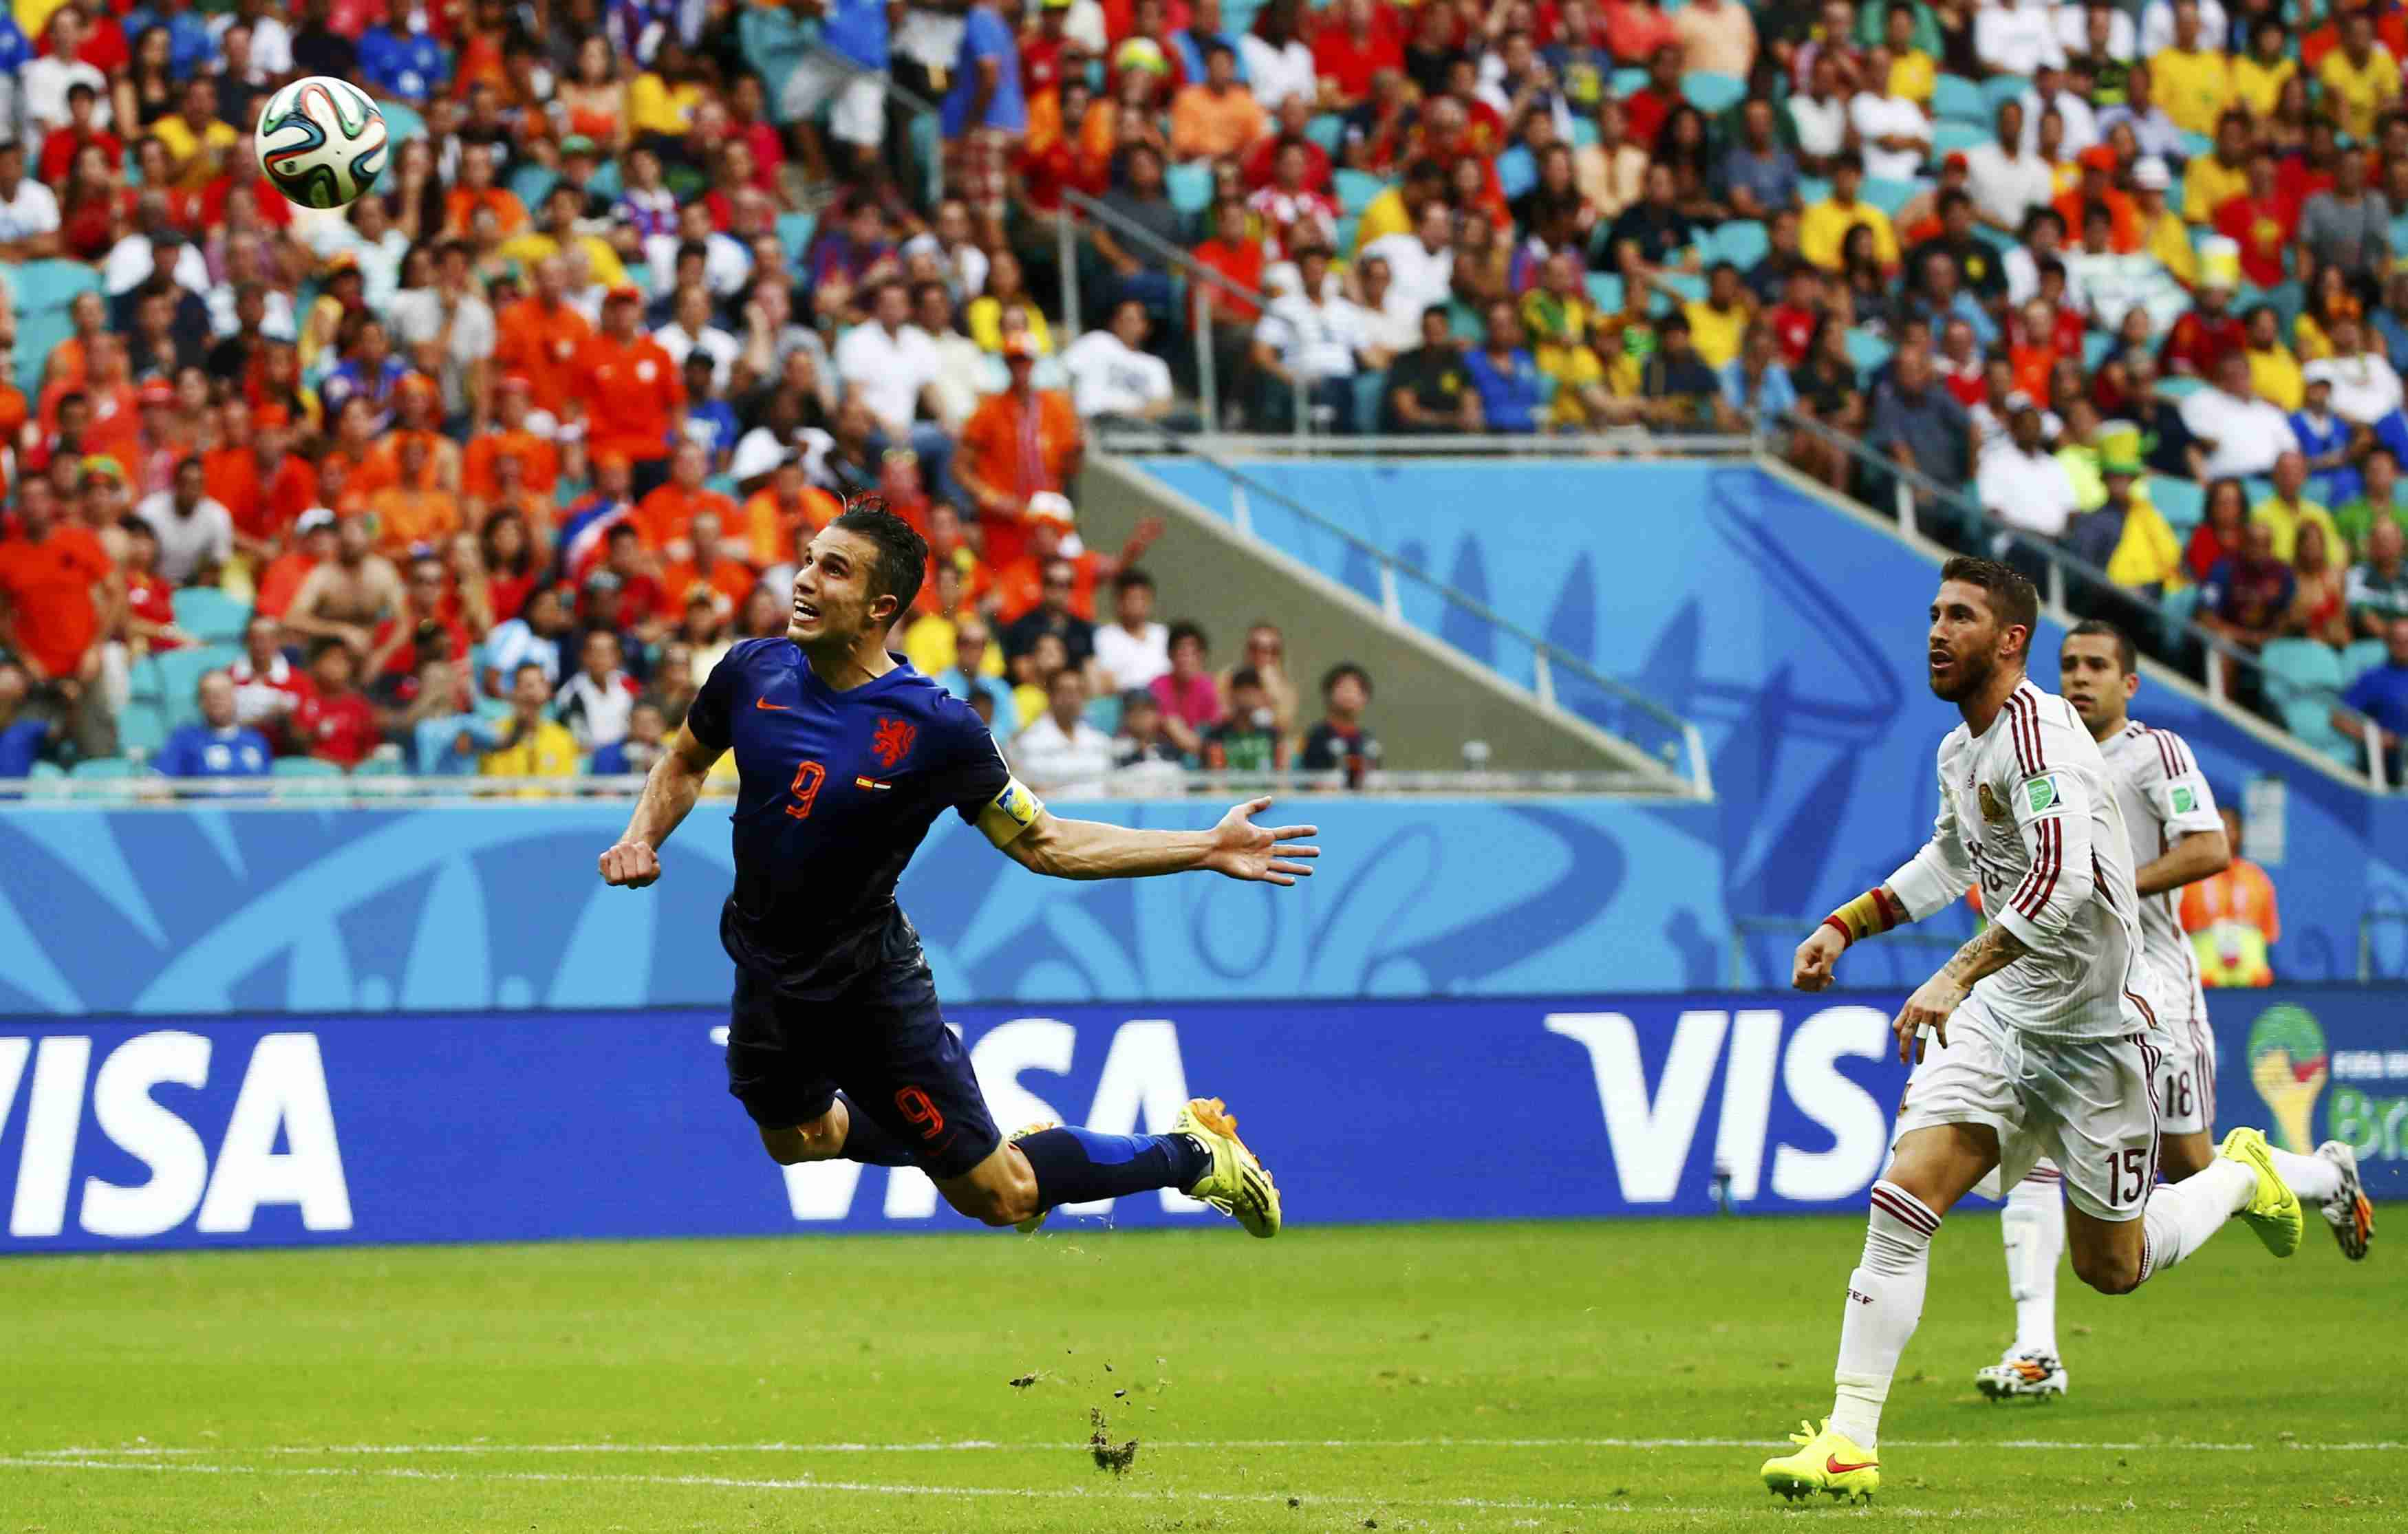 Кокой Счетпрогноз Футбол Испания И Голландия 13 Июнь 2018